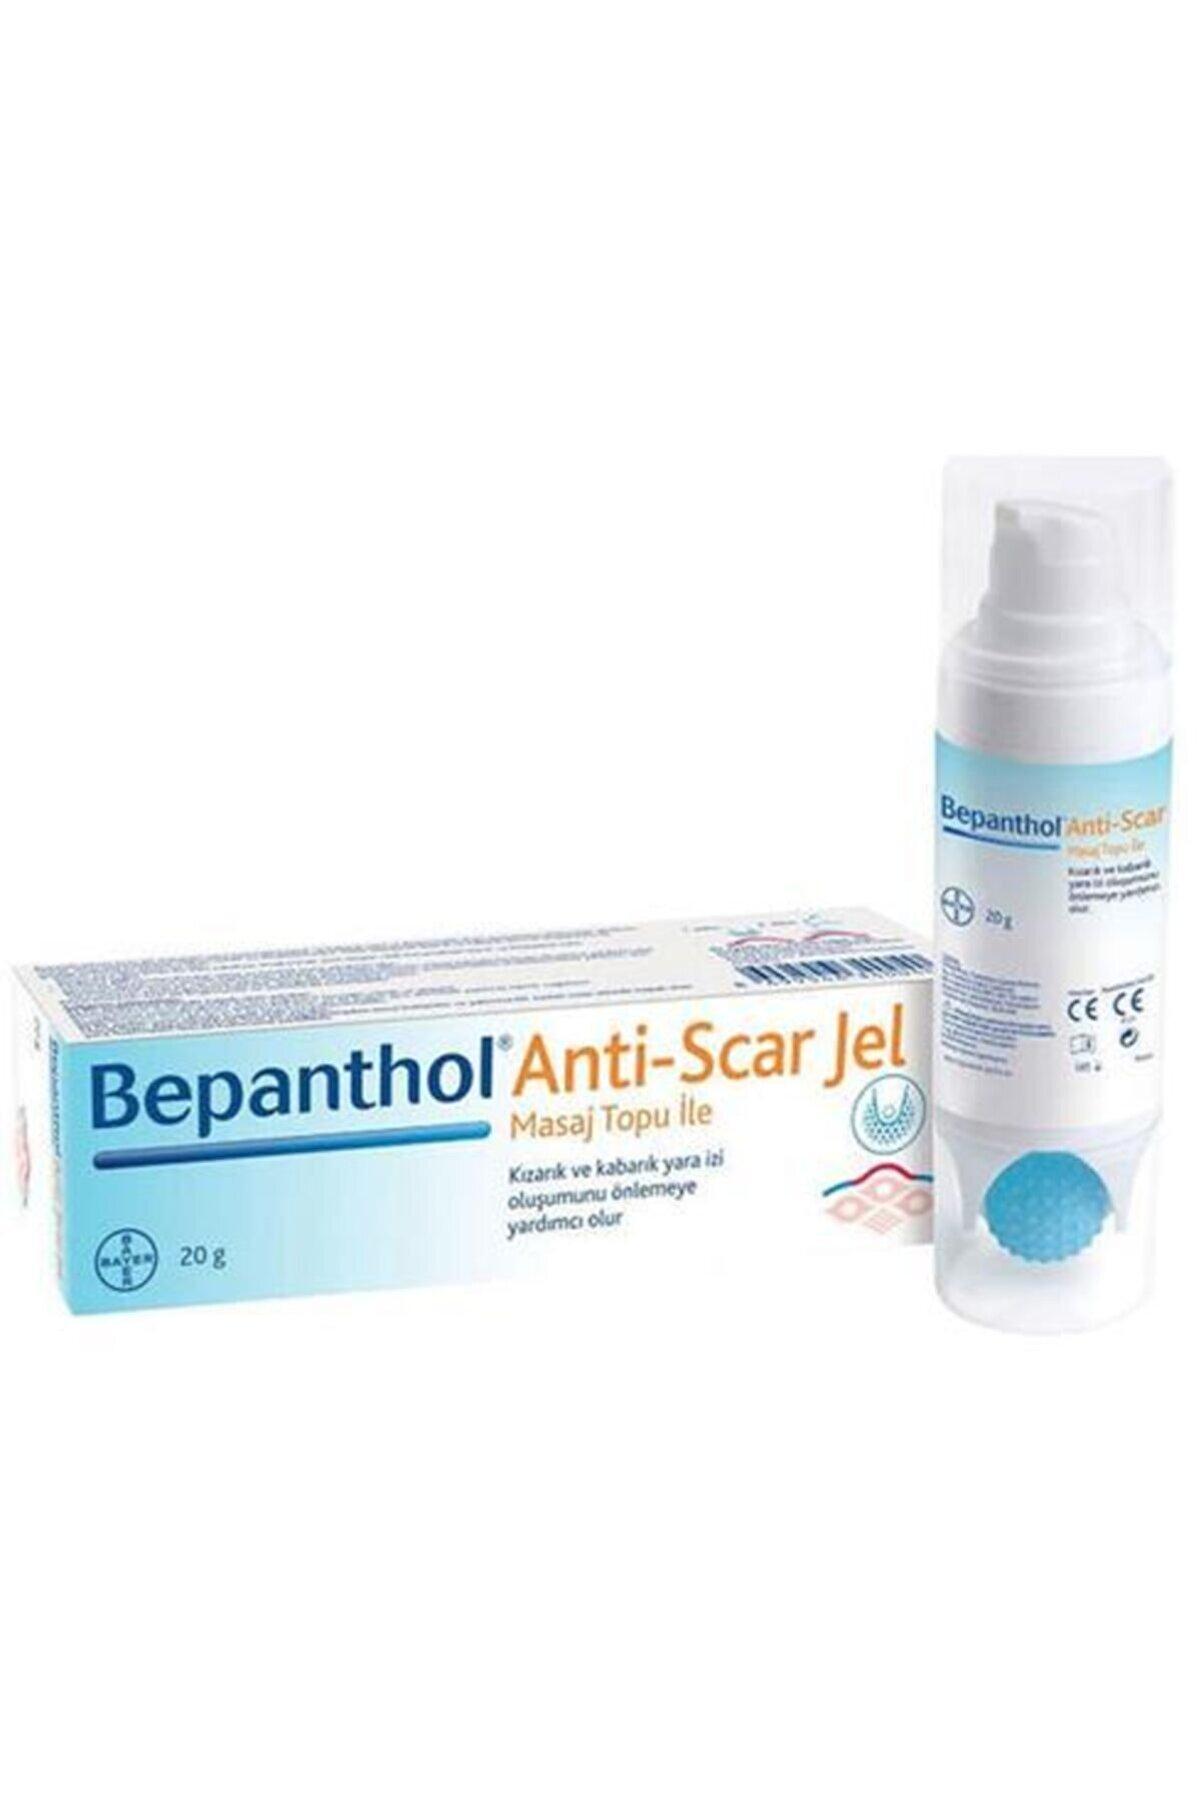 Bepanthol Anti-scar Jel 20gr   Yara Izi Için